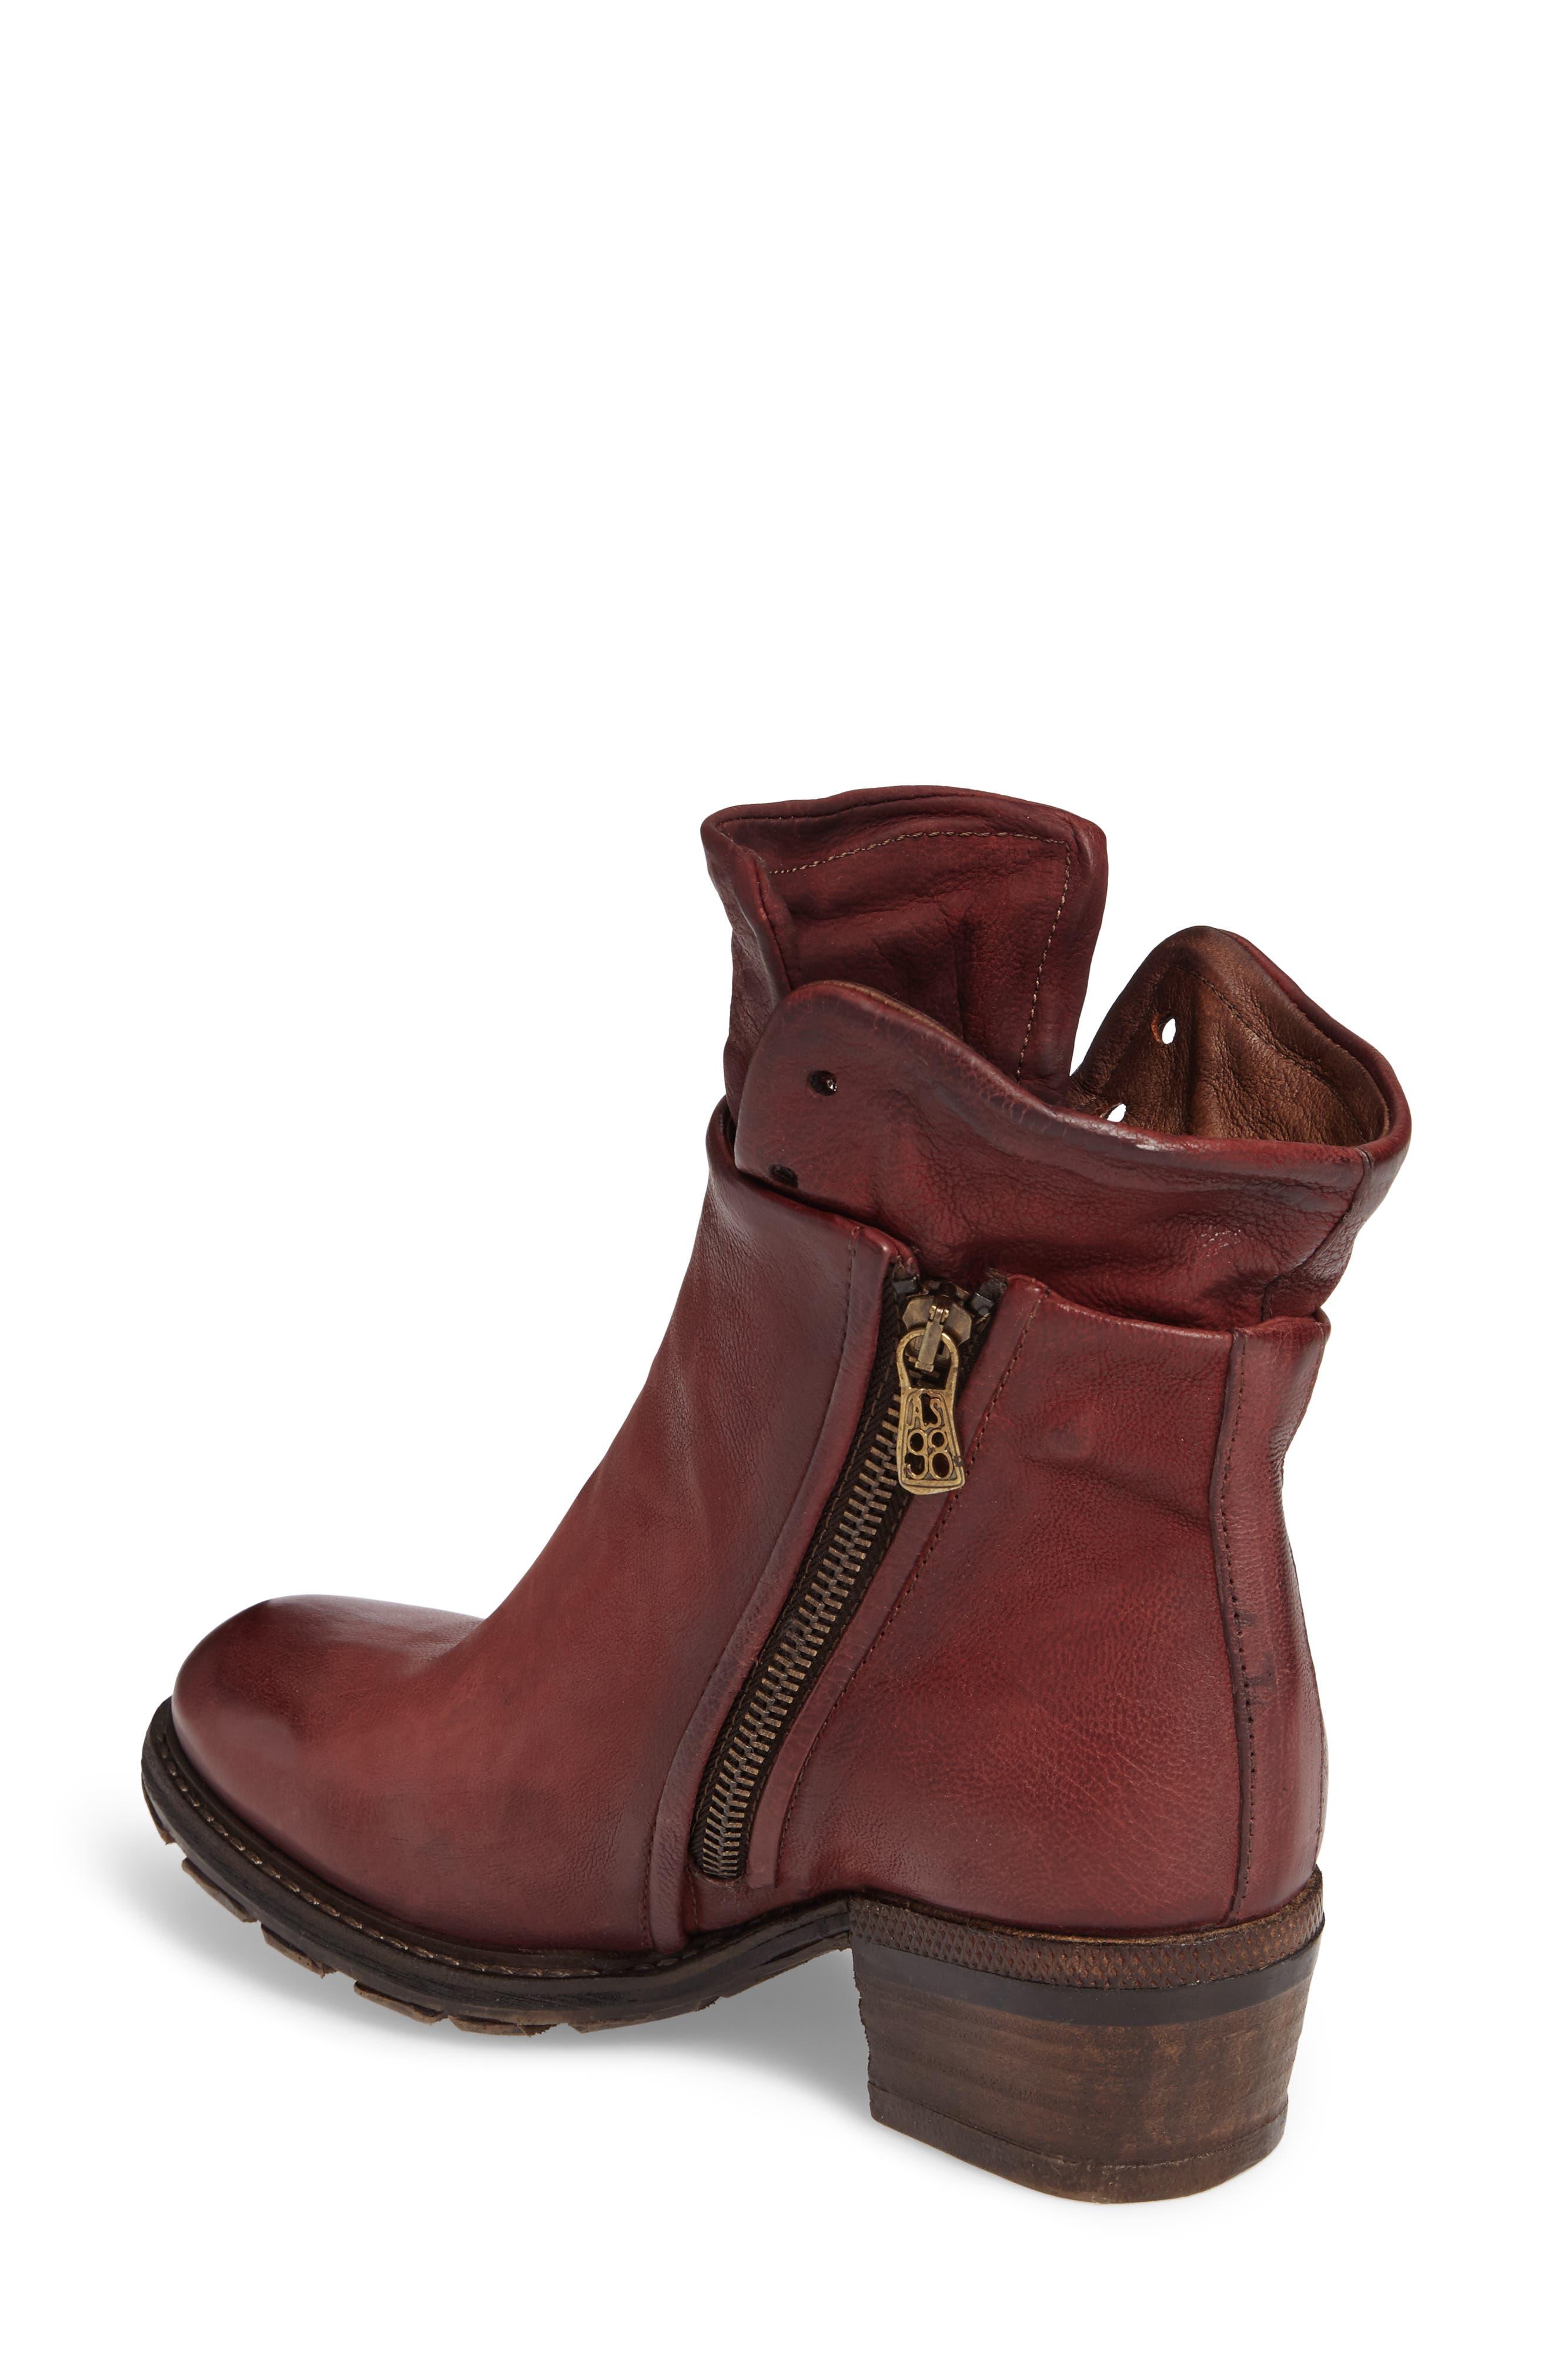 A.S. 98 Cadmus Boot,                             Alternate thumbnail 2, color,                             Amaranto